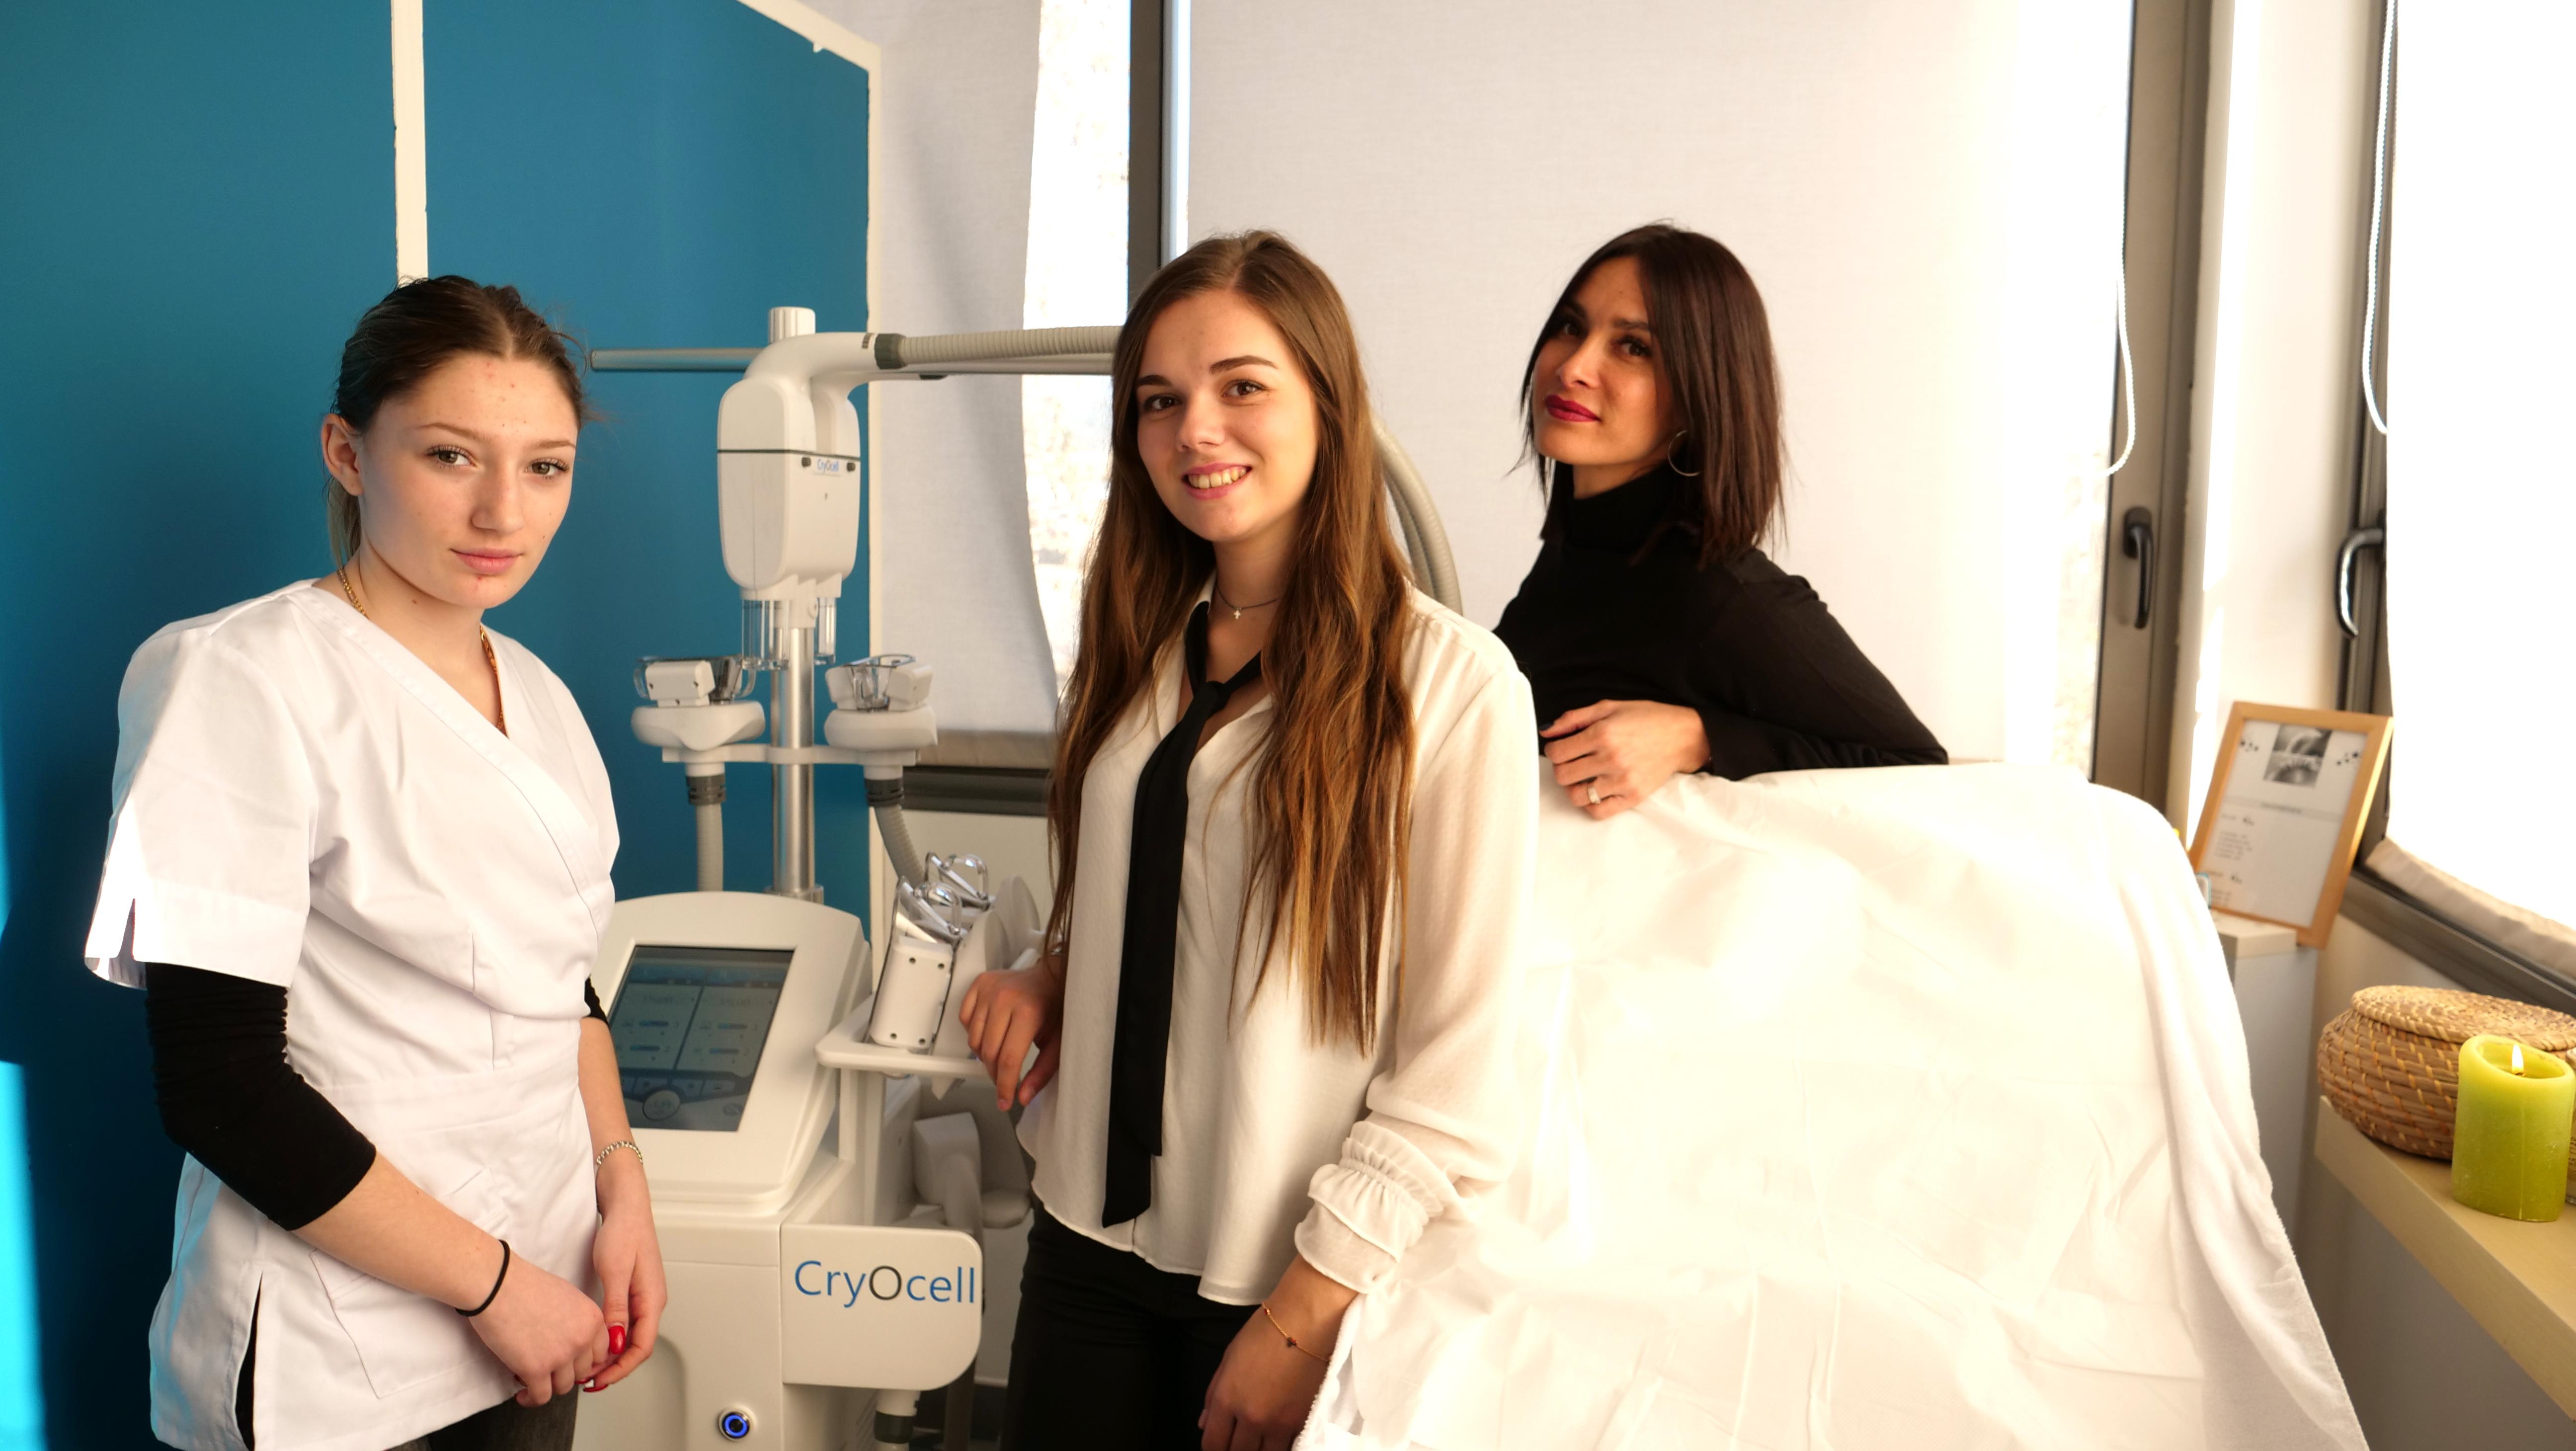 Le CryoCell chez Beauty Shop Esthetic Manosque